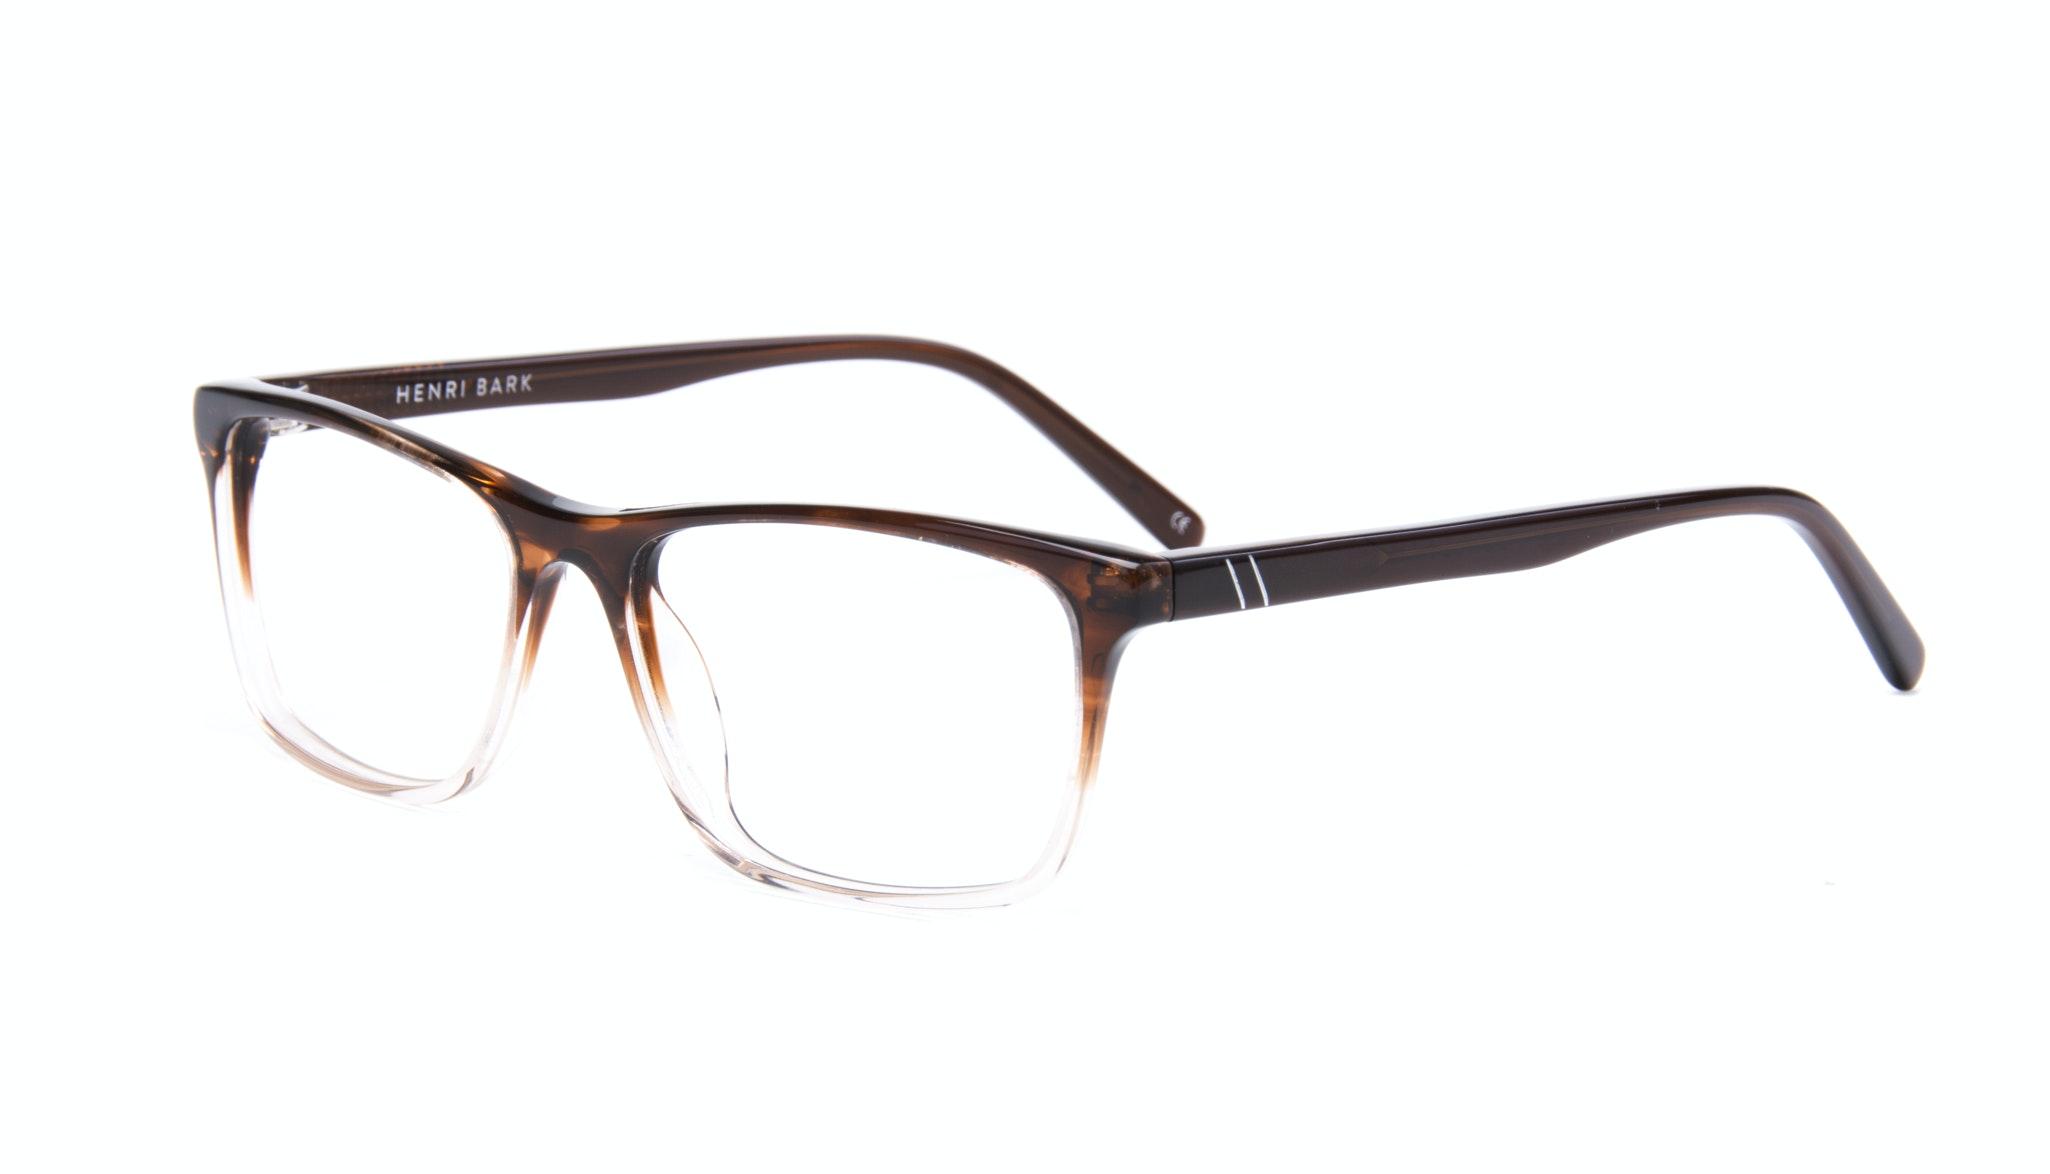 Affordable Fashion Glasses Rectangle Eyeglasses Men Henri Bark Tilt